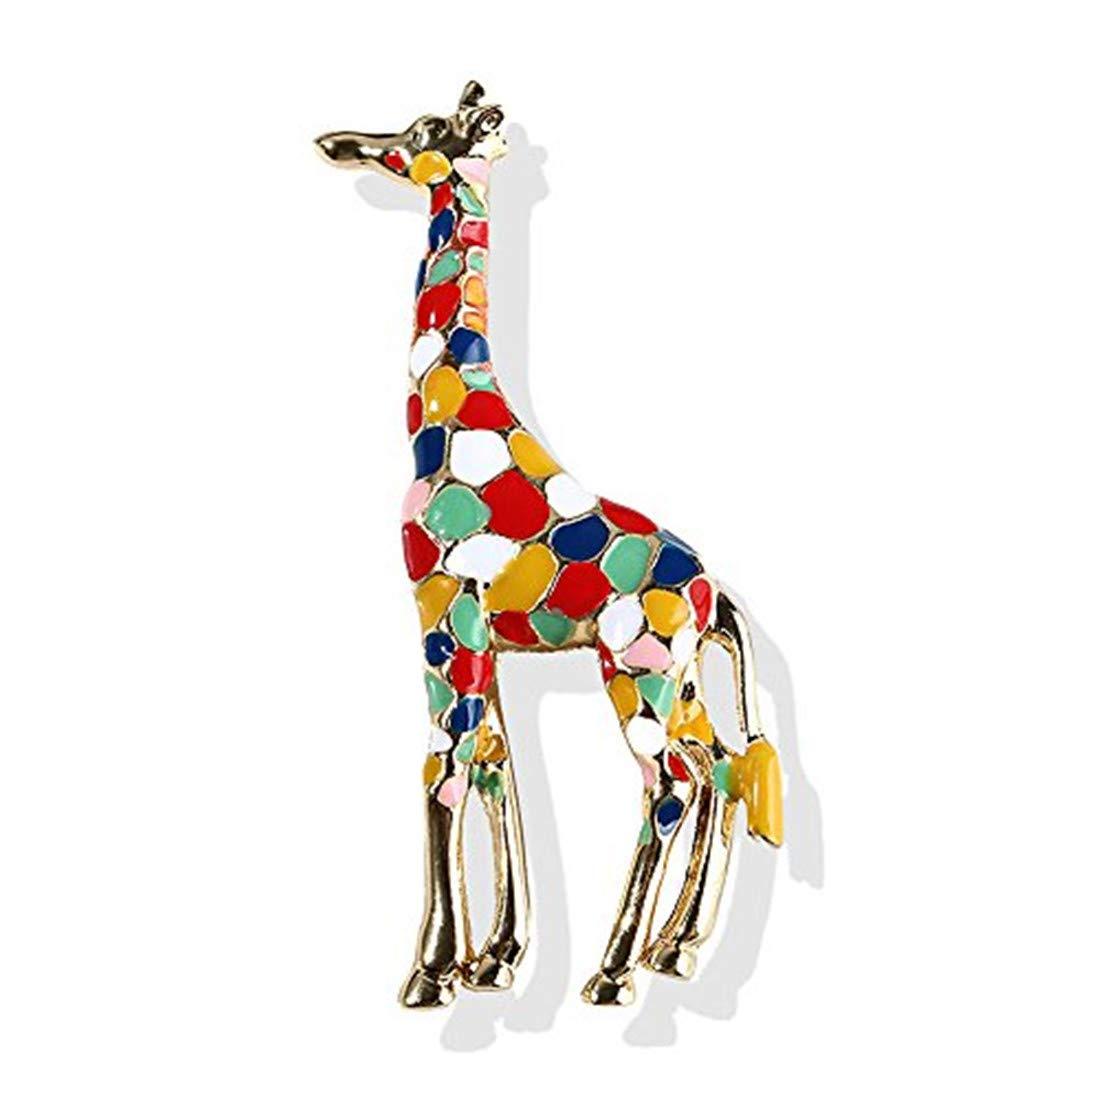 SwanElegant Cute Enamel Lapel Brooch Pin Set Girls Women,Animal Brooch Pin Badges Clothes Bags Backpacks Hat(Giraffe-Colorful)